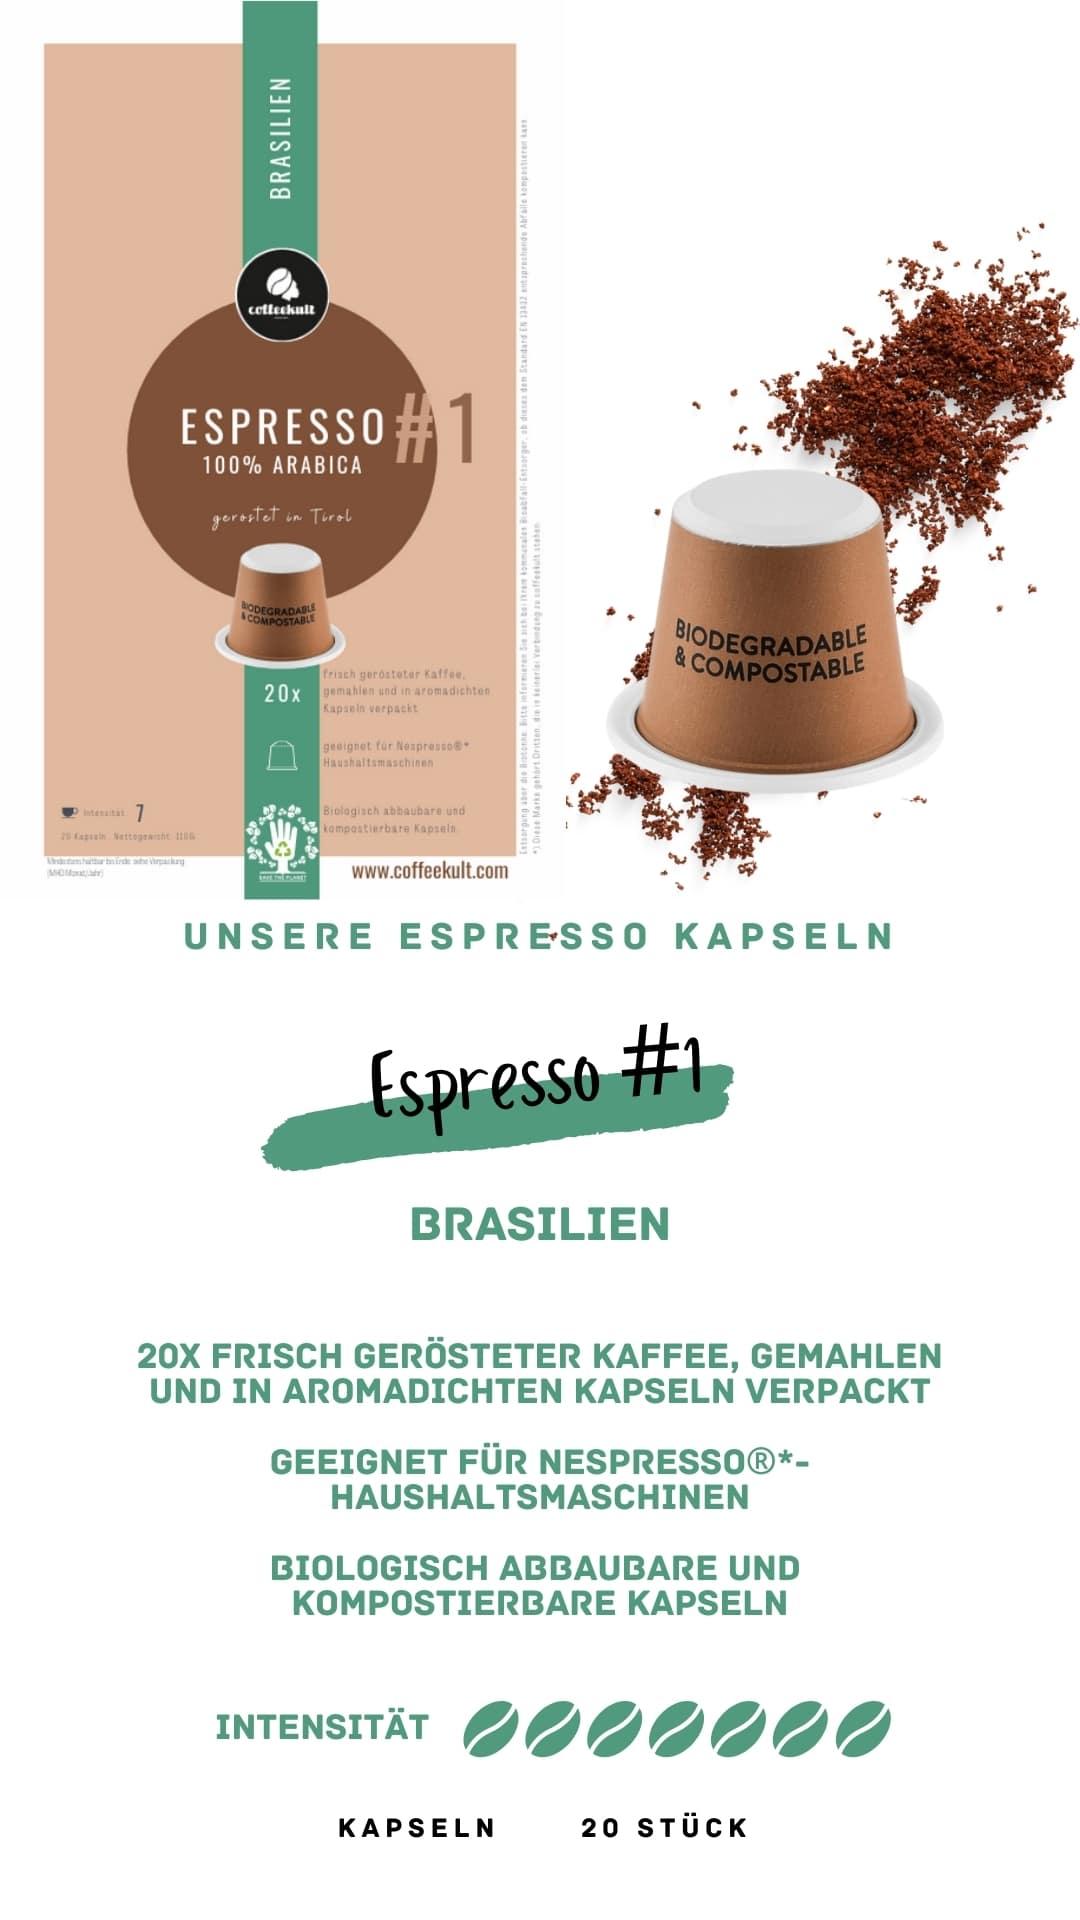 coffeekult coffee frisch geröstet barista kaffeerösterei innsbruck arabica bohnen brasilien espresso kapseln